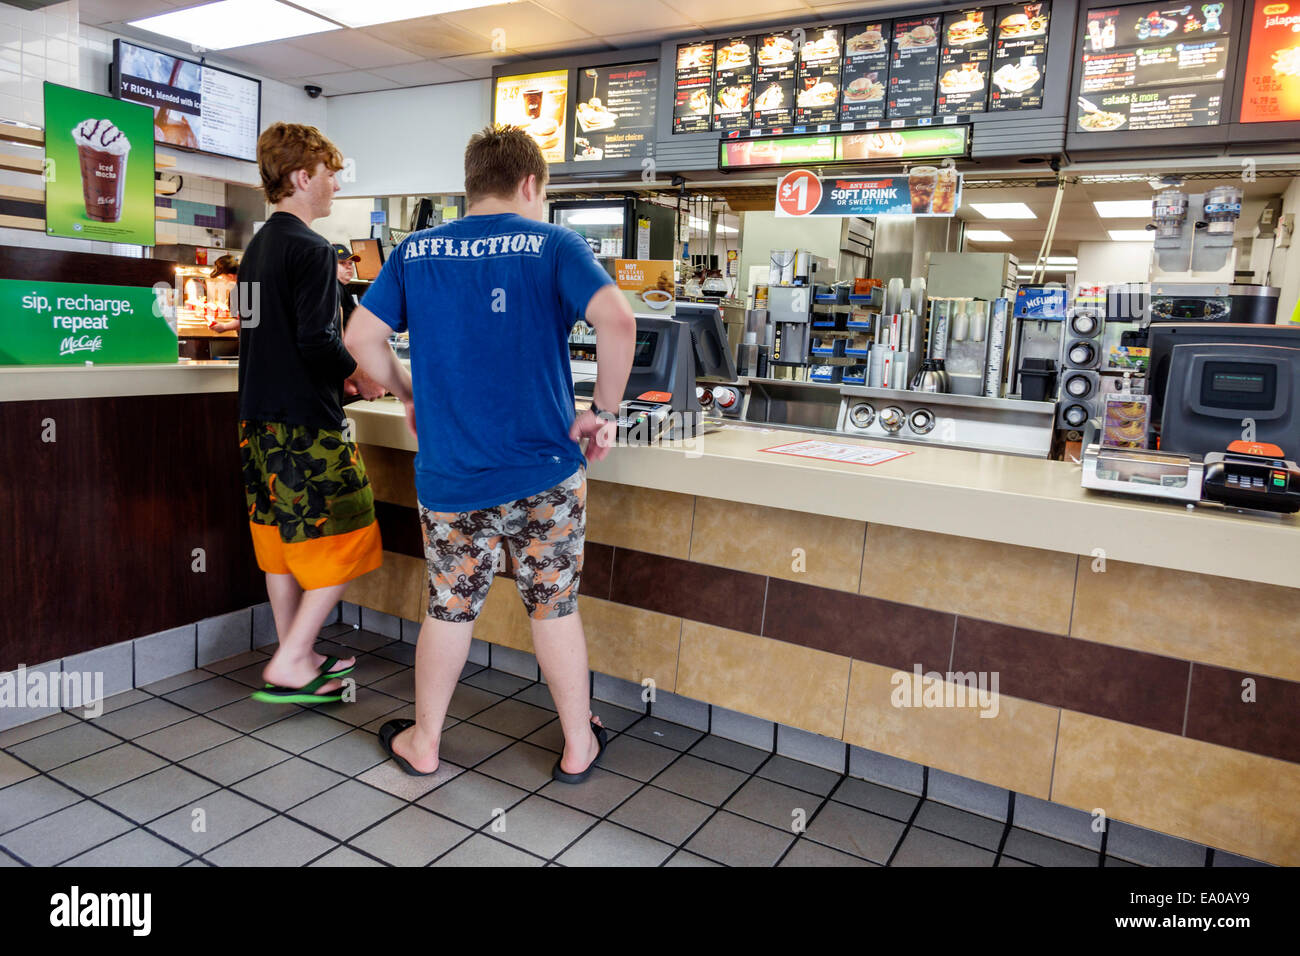 Florida Okeechobee McDonald's restaurant fast food inside counter teen boy friends customers - Stock Image